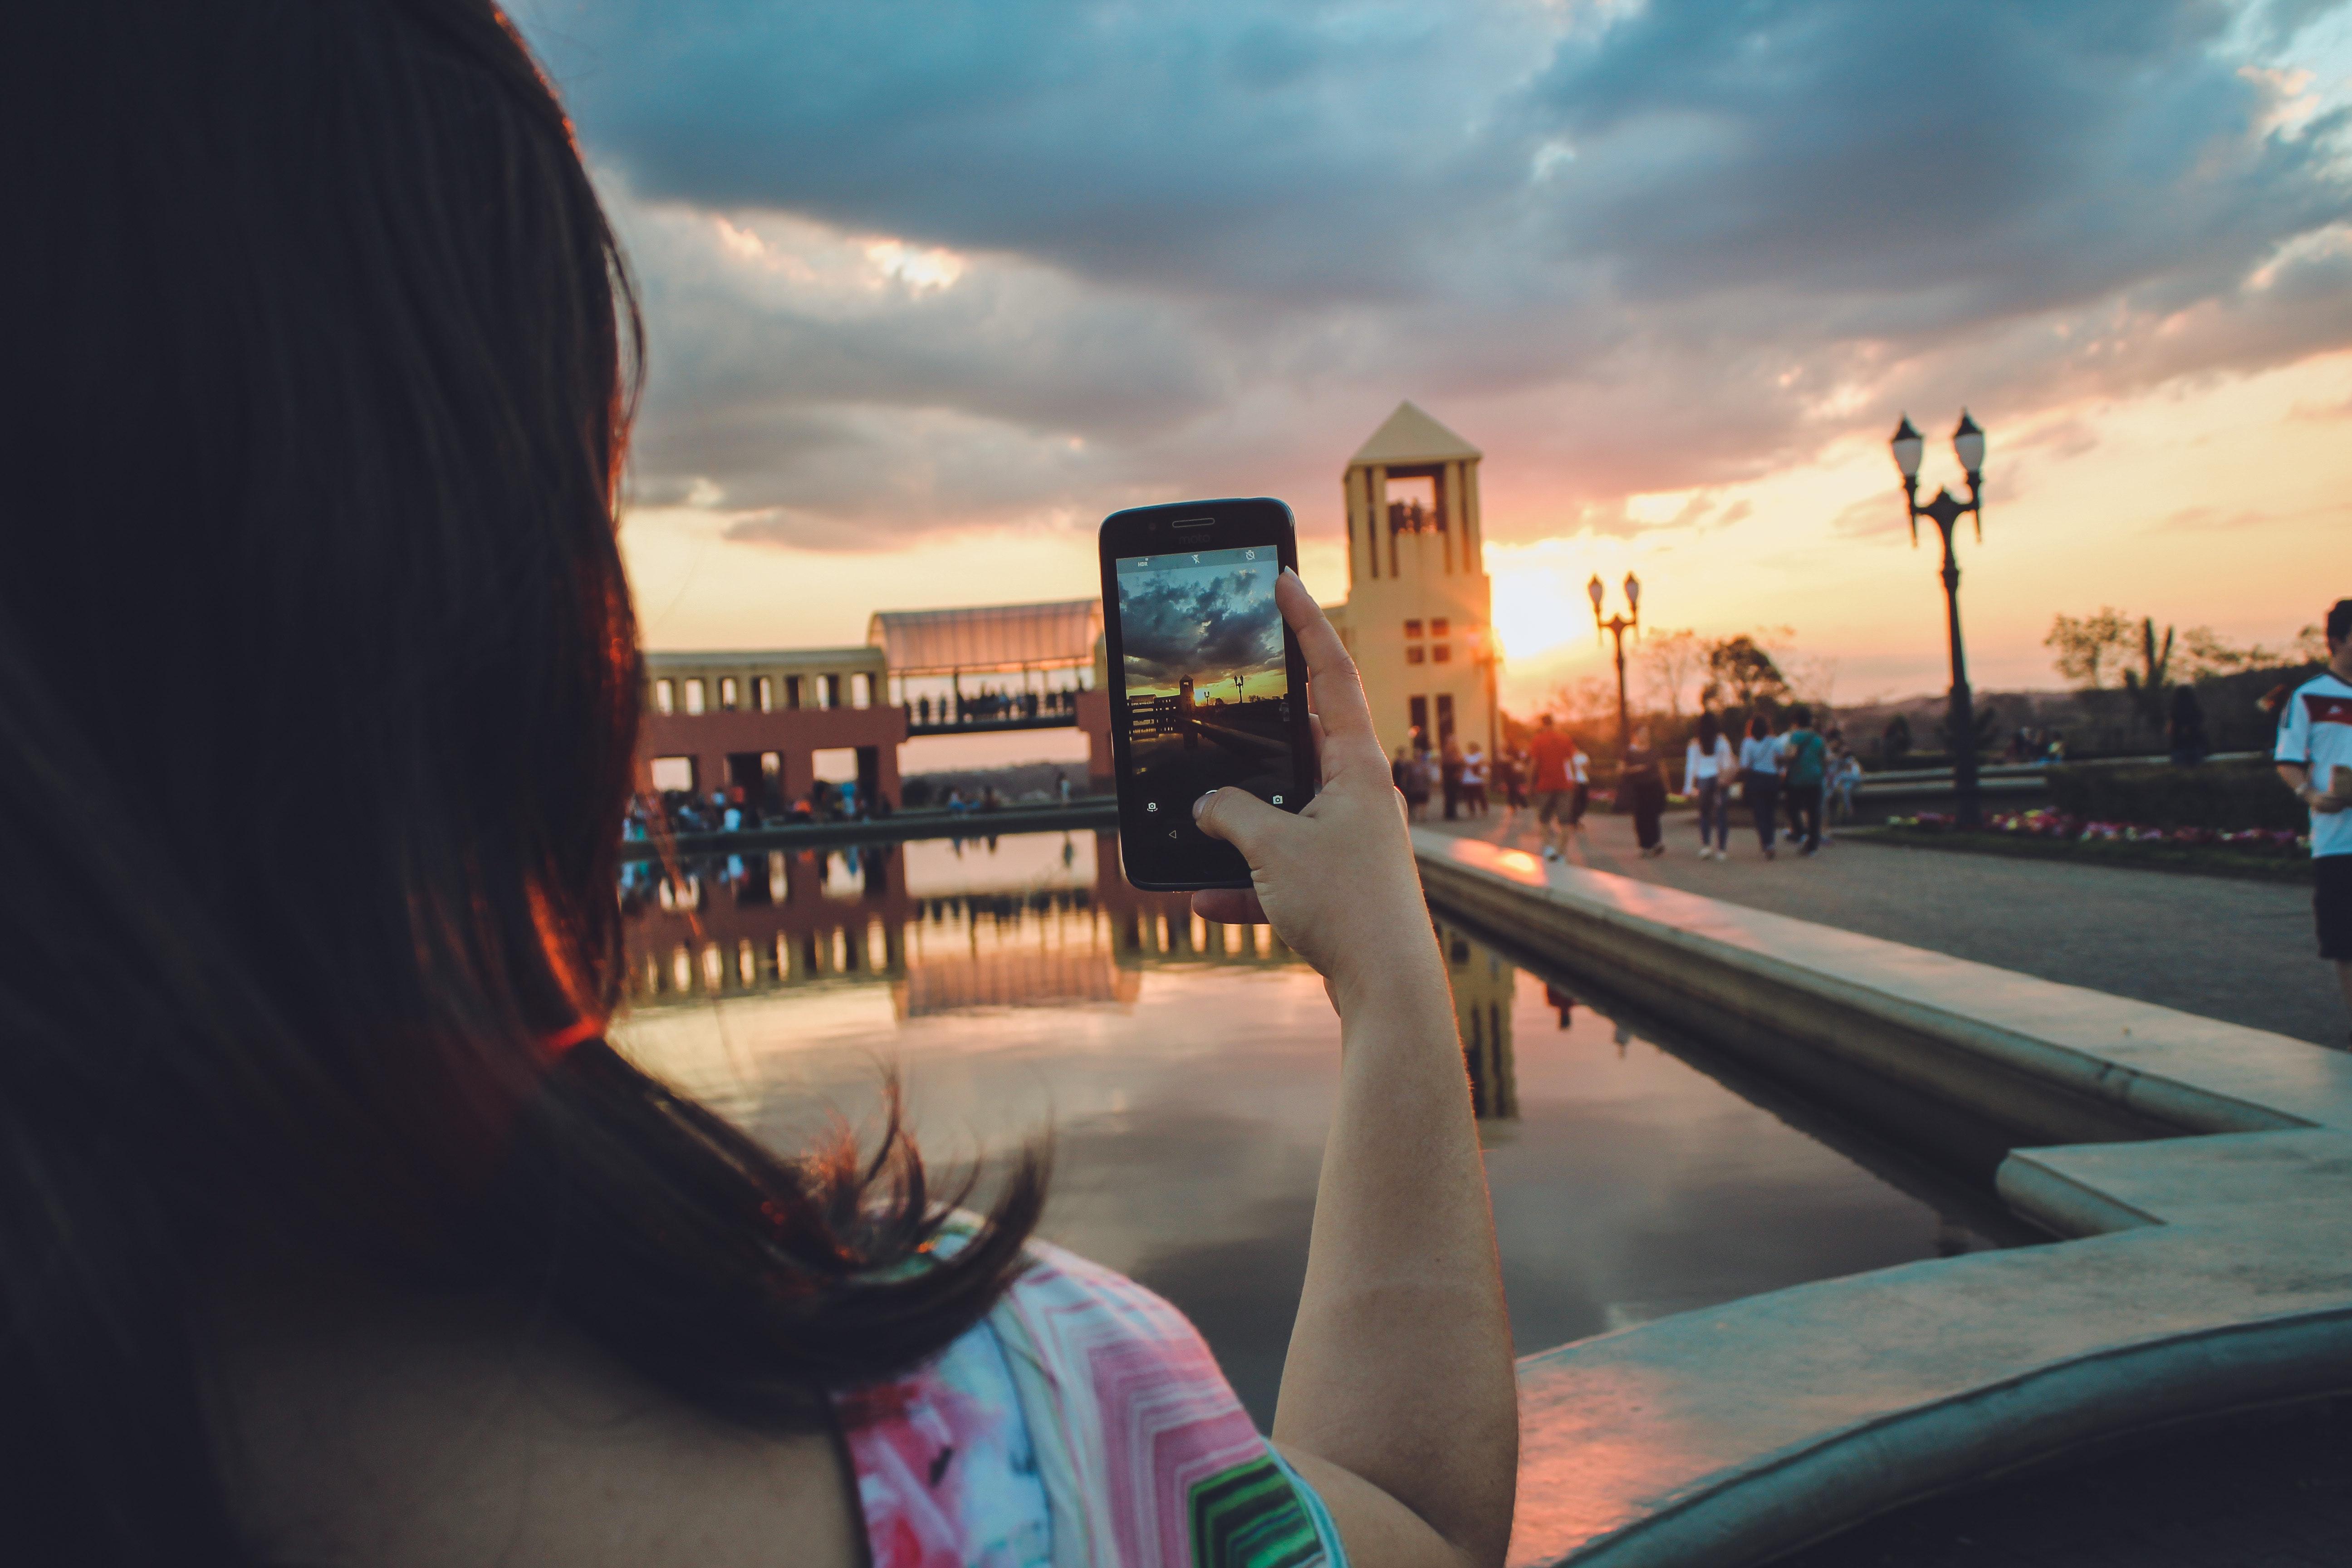 Woman holding smartphone capturing sunset photo